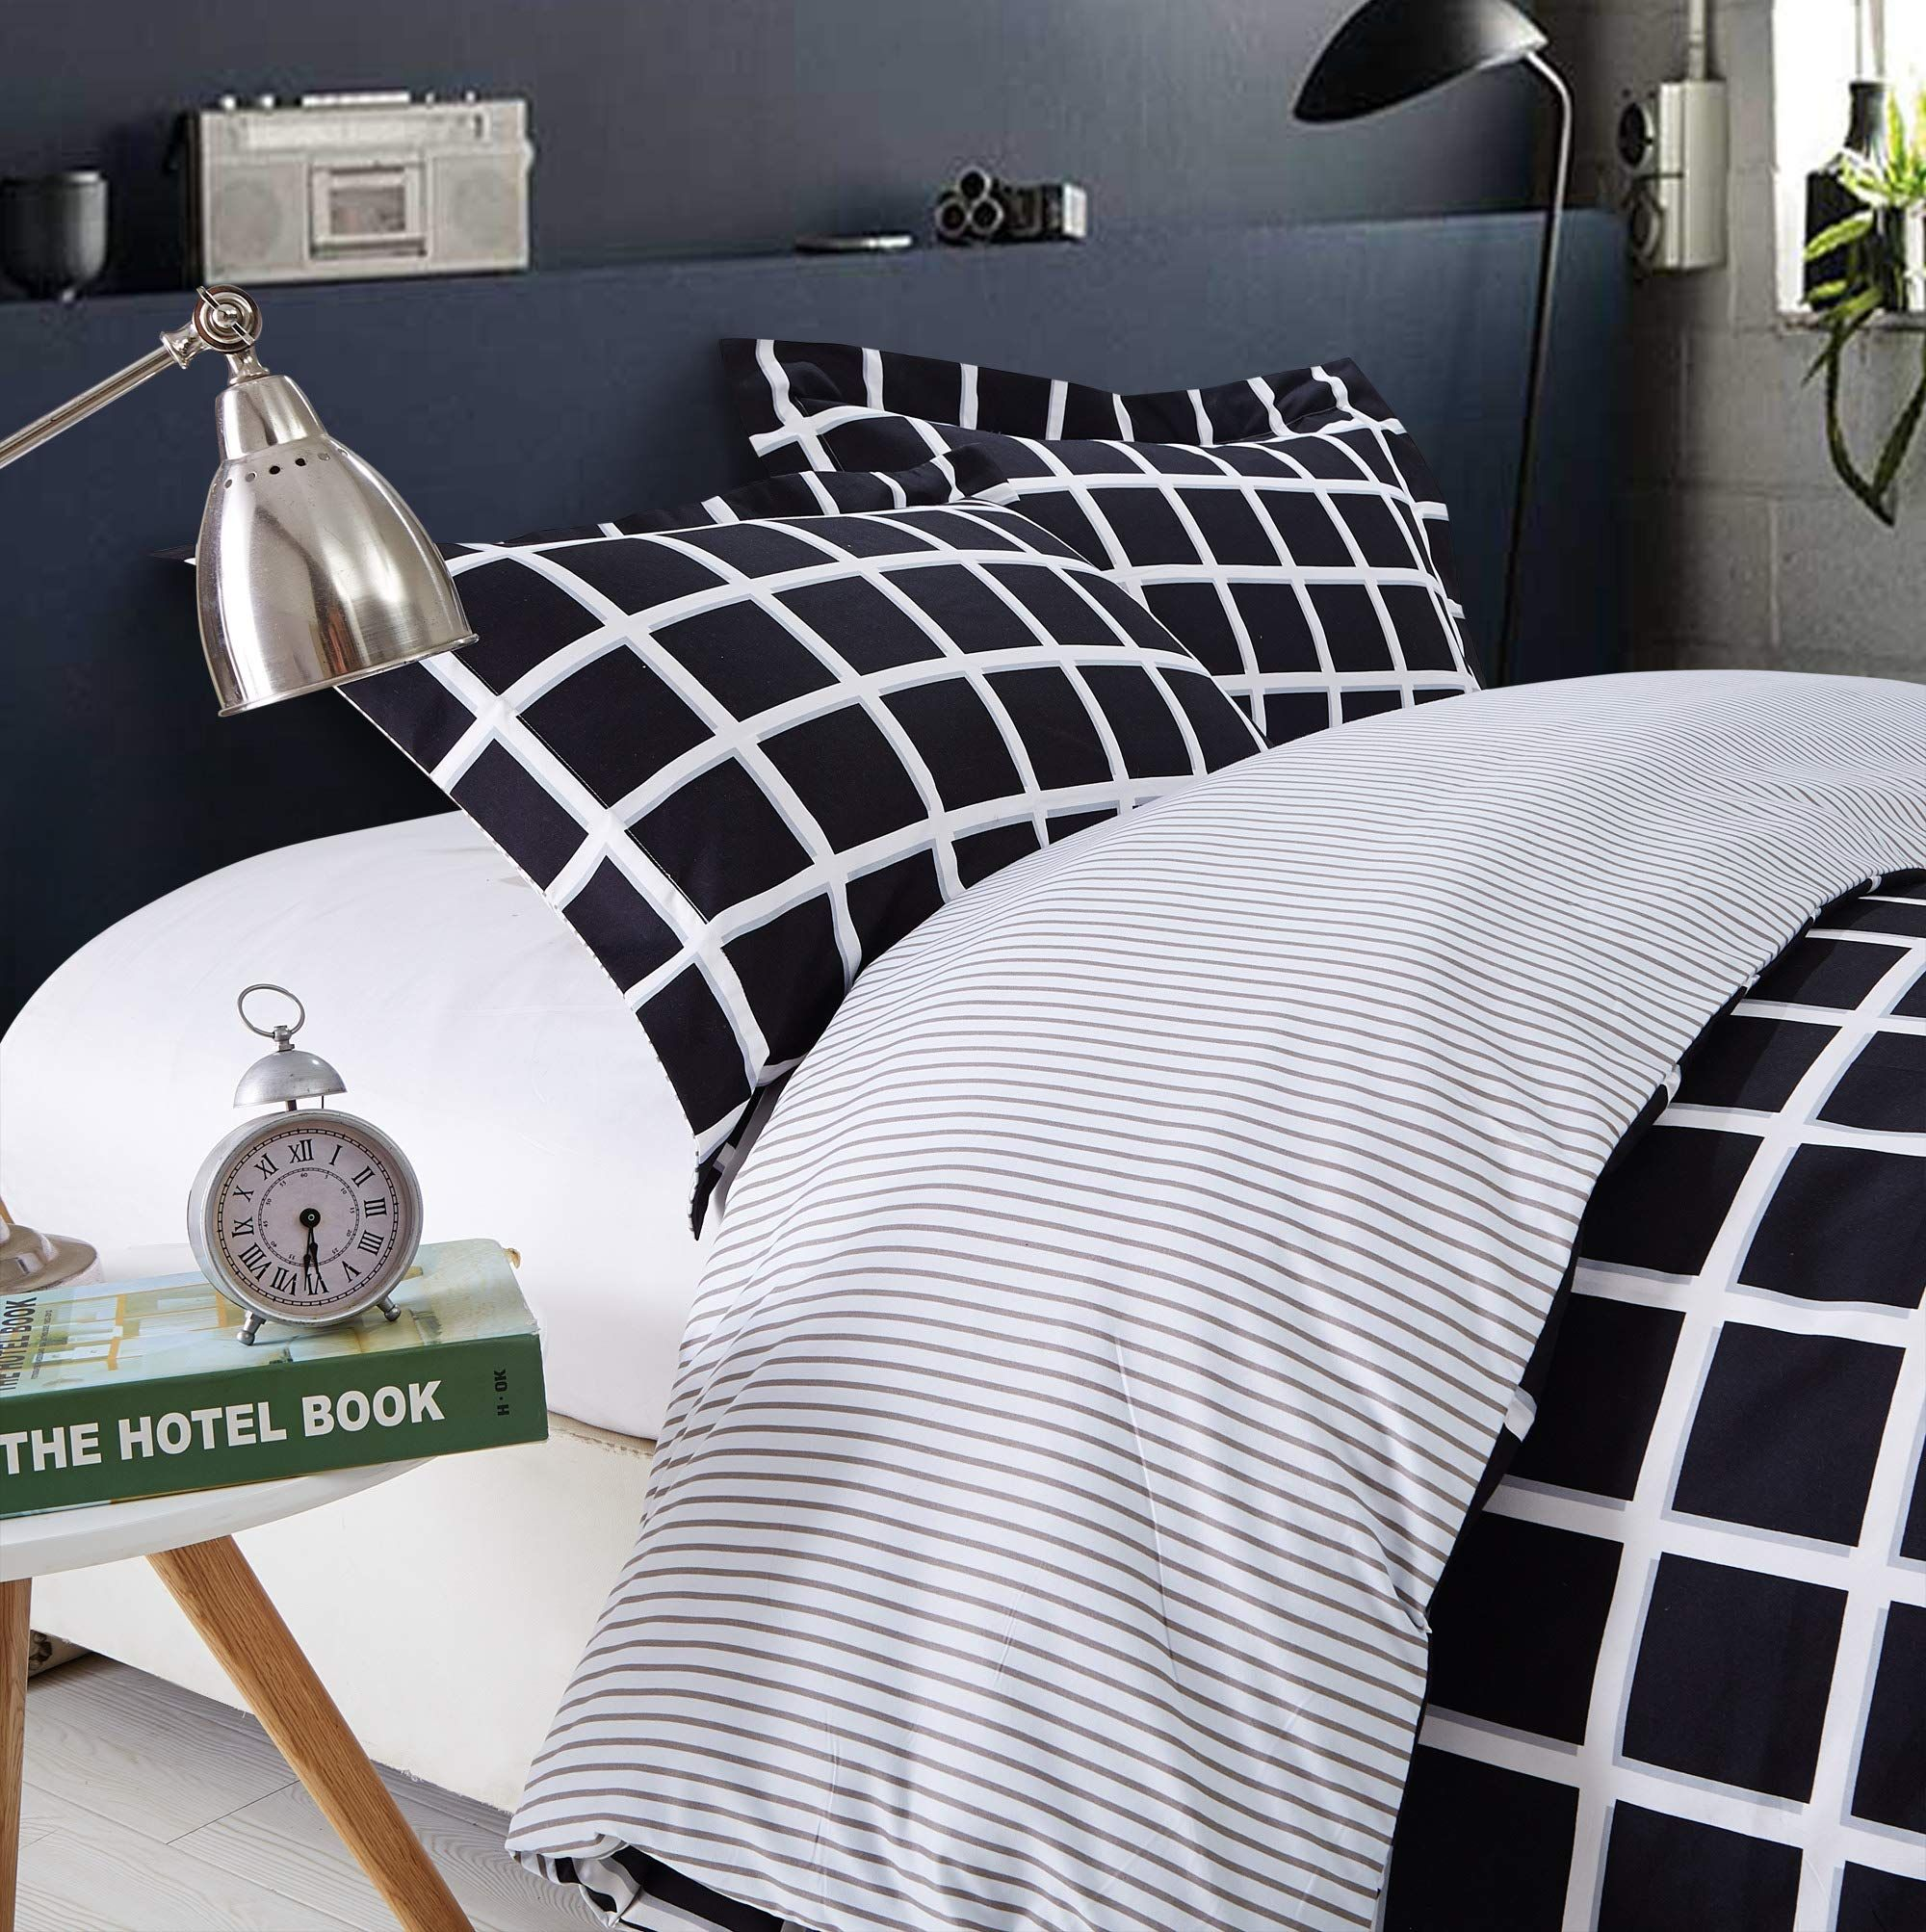 90bf18c434 Top Finel Queen Duvet Cover Bedding Set 2 Pillow Shams Breathable SuperSoft  Durable WrinkleResistant3PcsBlackWhiteandSquare >>> Want additional info?